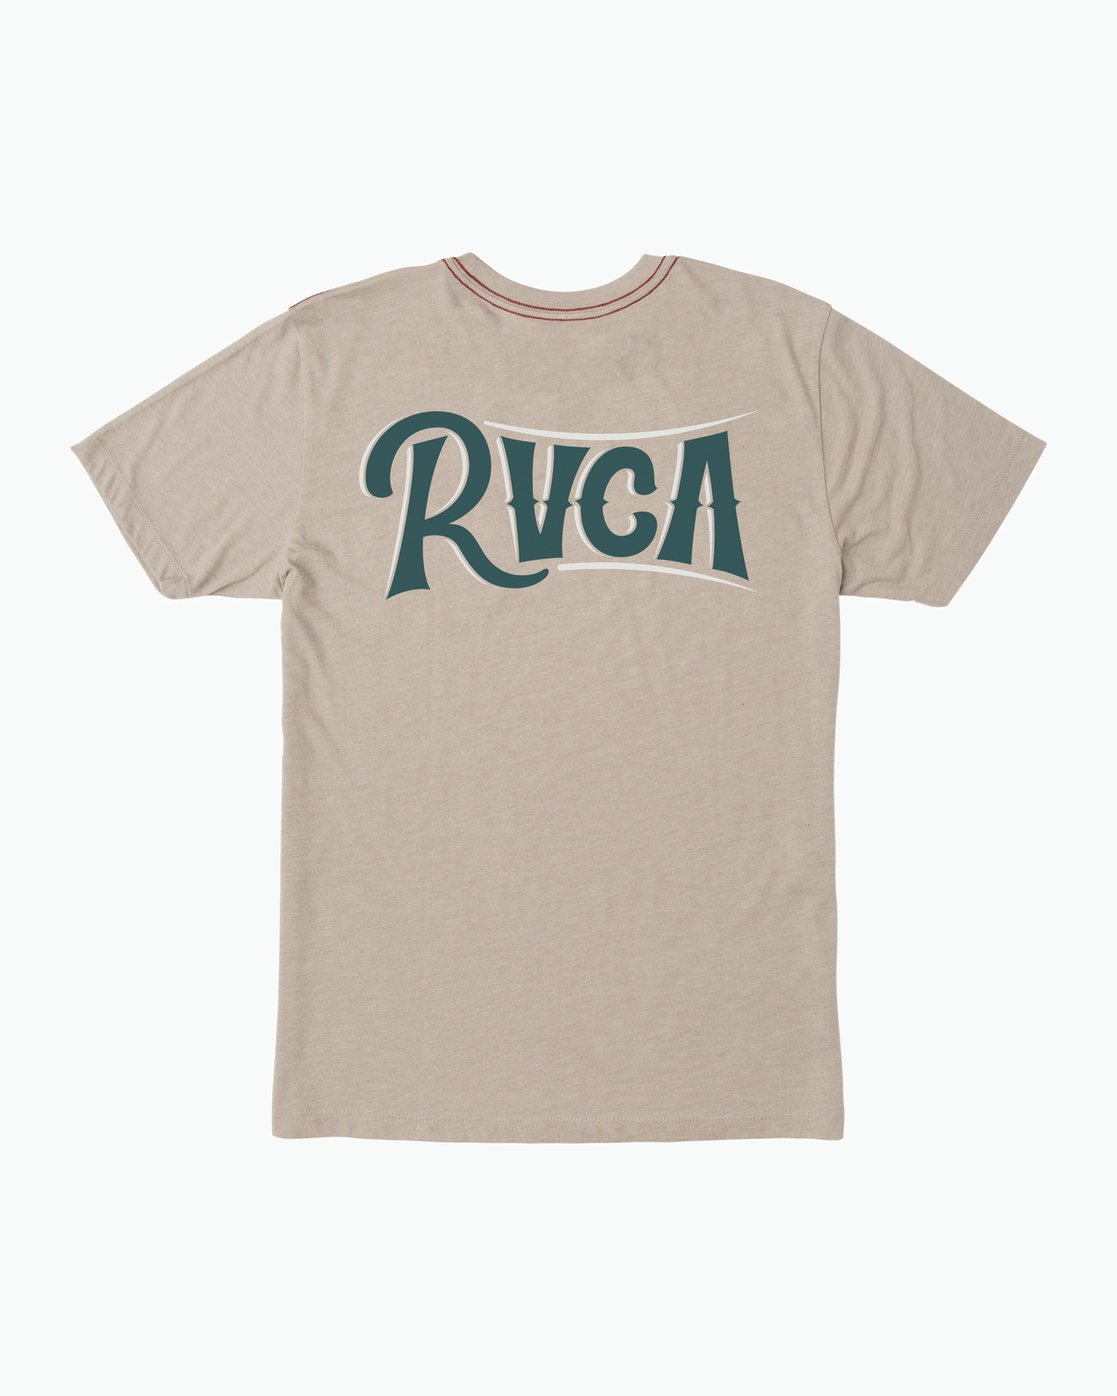 0 Sagebrush Pocket T-Shirt Multicolor M416SRSA RVCA